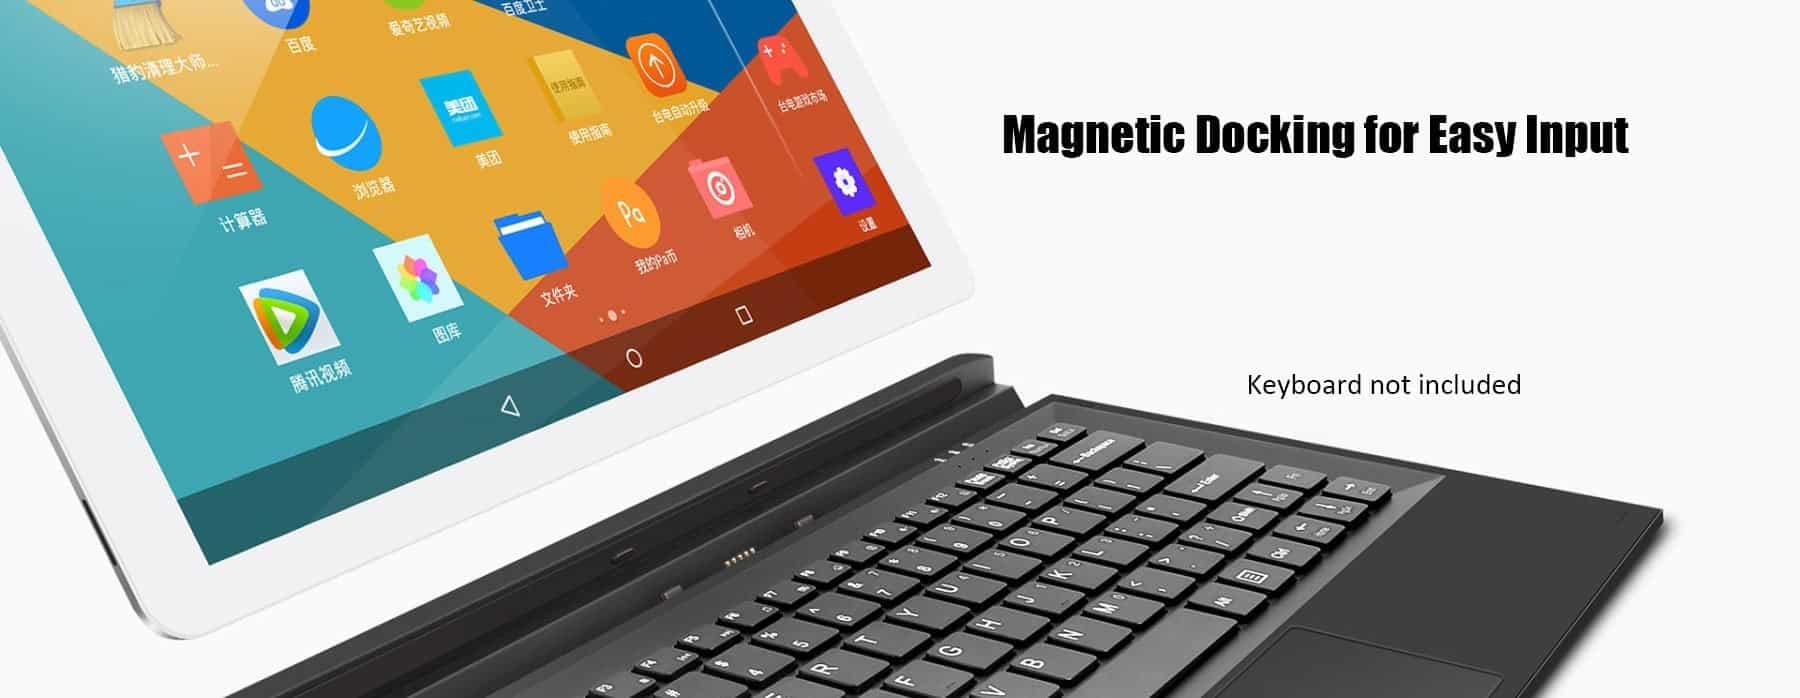 Teclast X16 Plus 2 in 1 Tablet PC